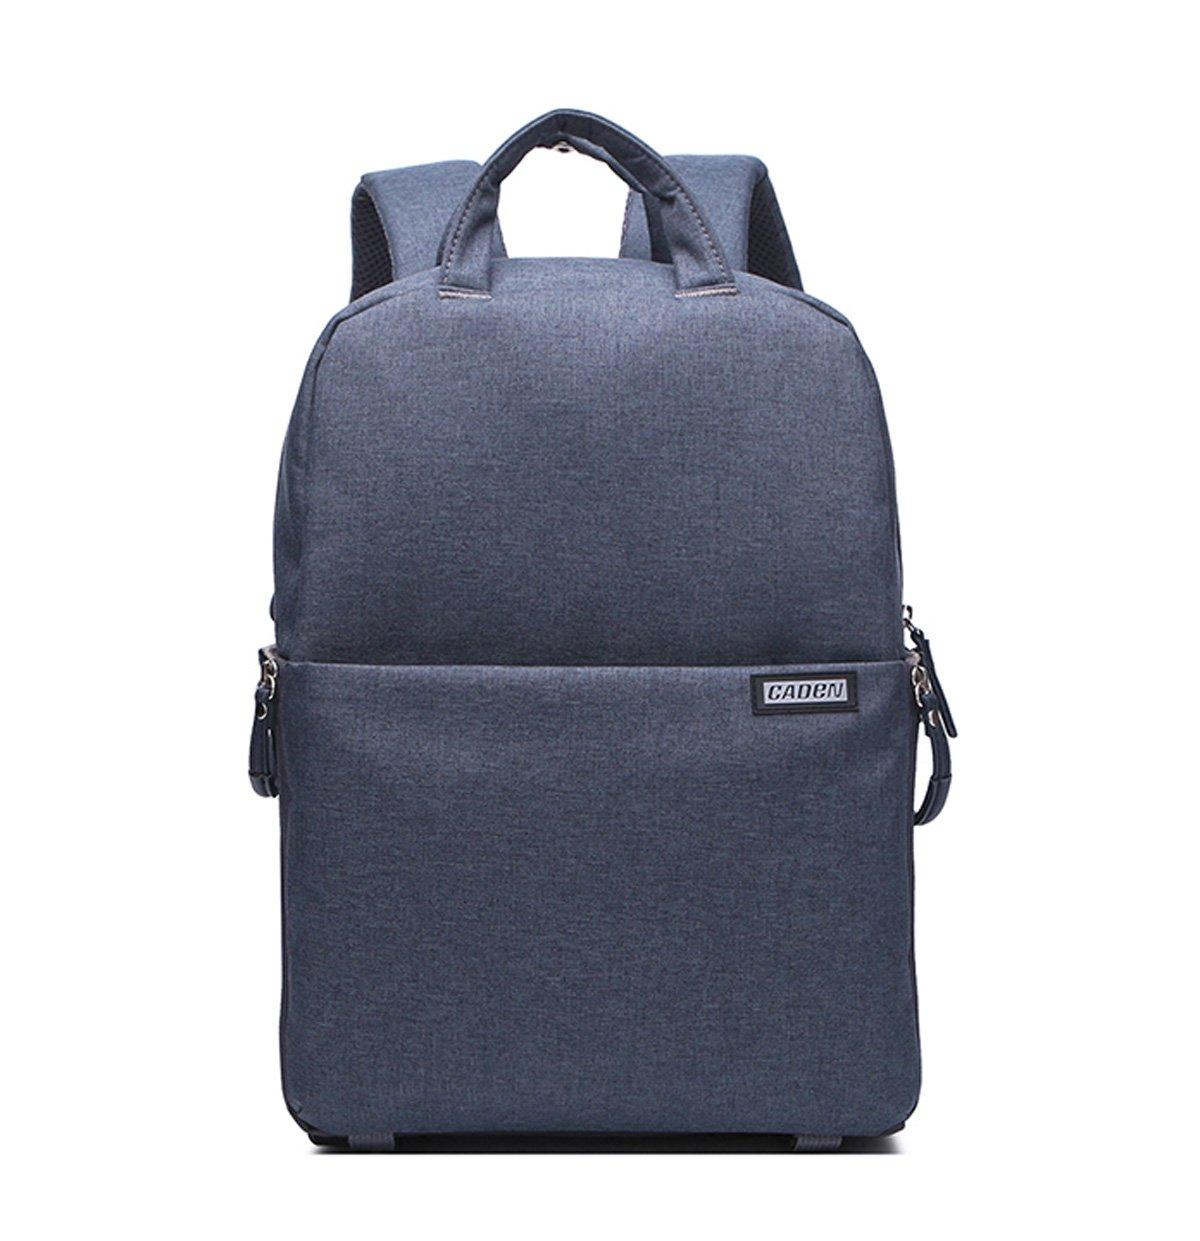 dae569257605 Camera Bag DSLR Laptop Backpack Waterproof Travel Large Size ...